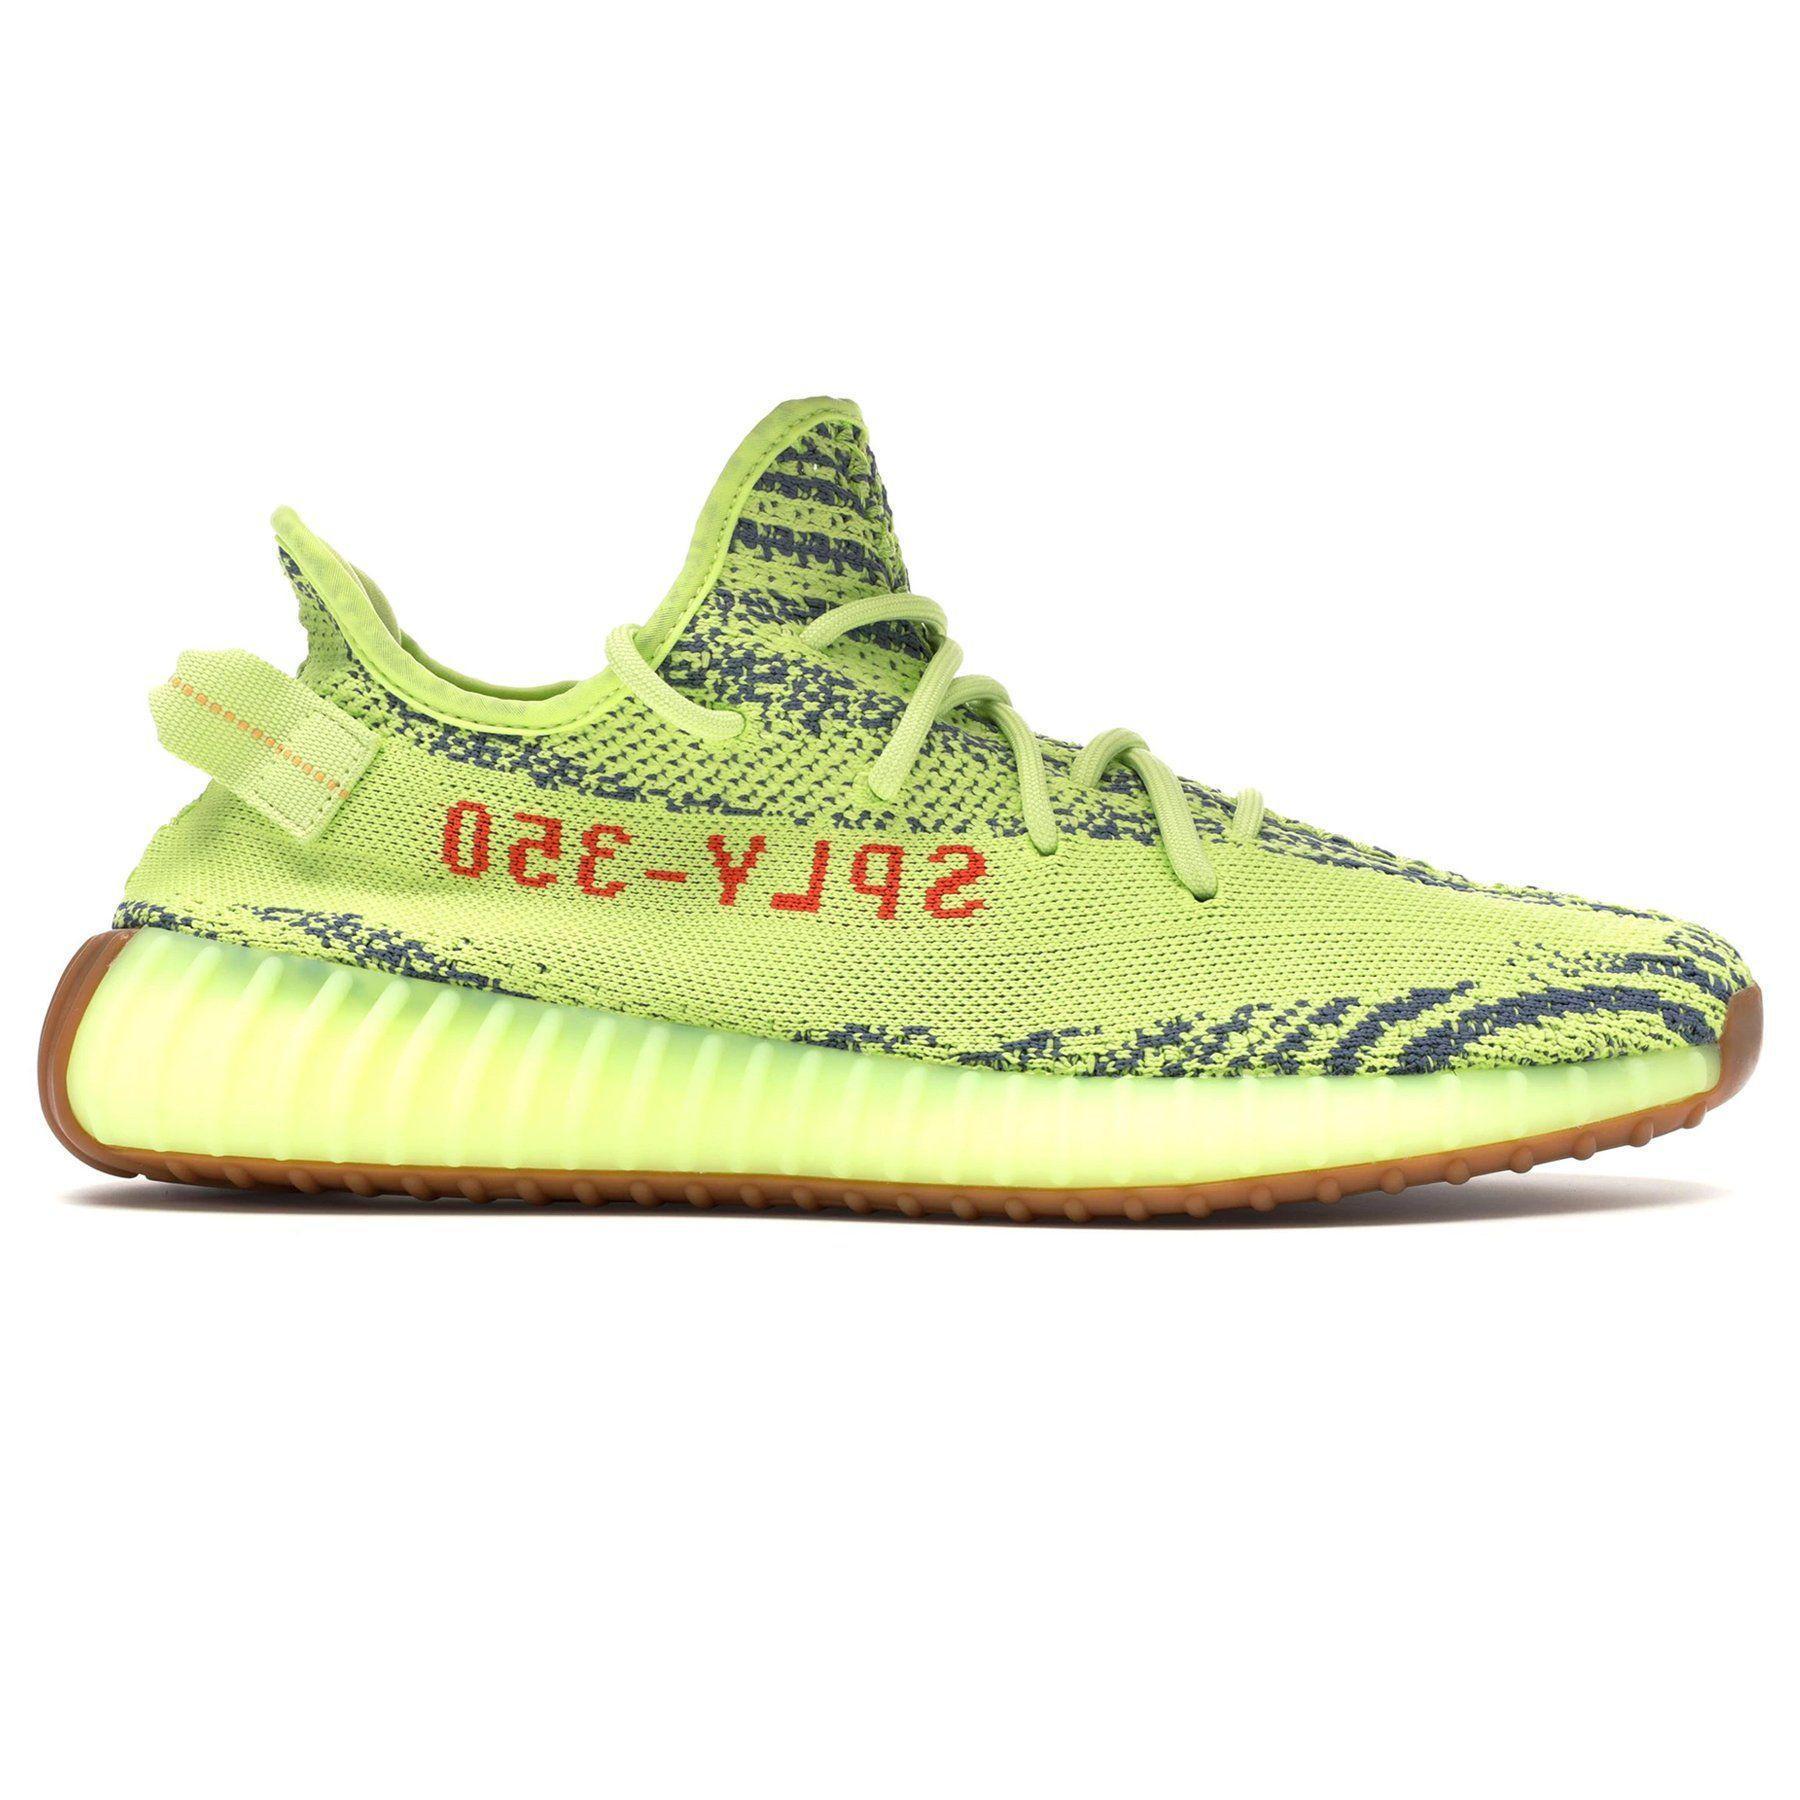 13519ec9 Yeezy Semi Frozen Yellow Boost 350 V2 By in Yellow for Men - Lyst